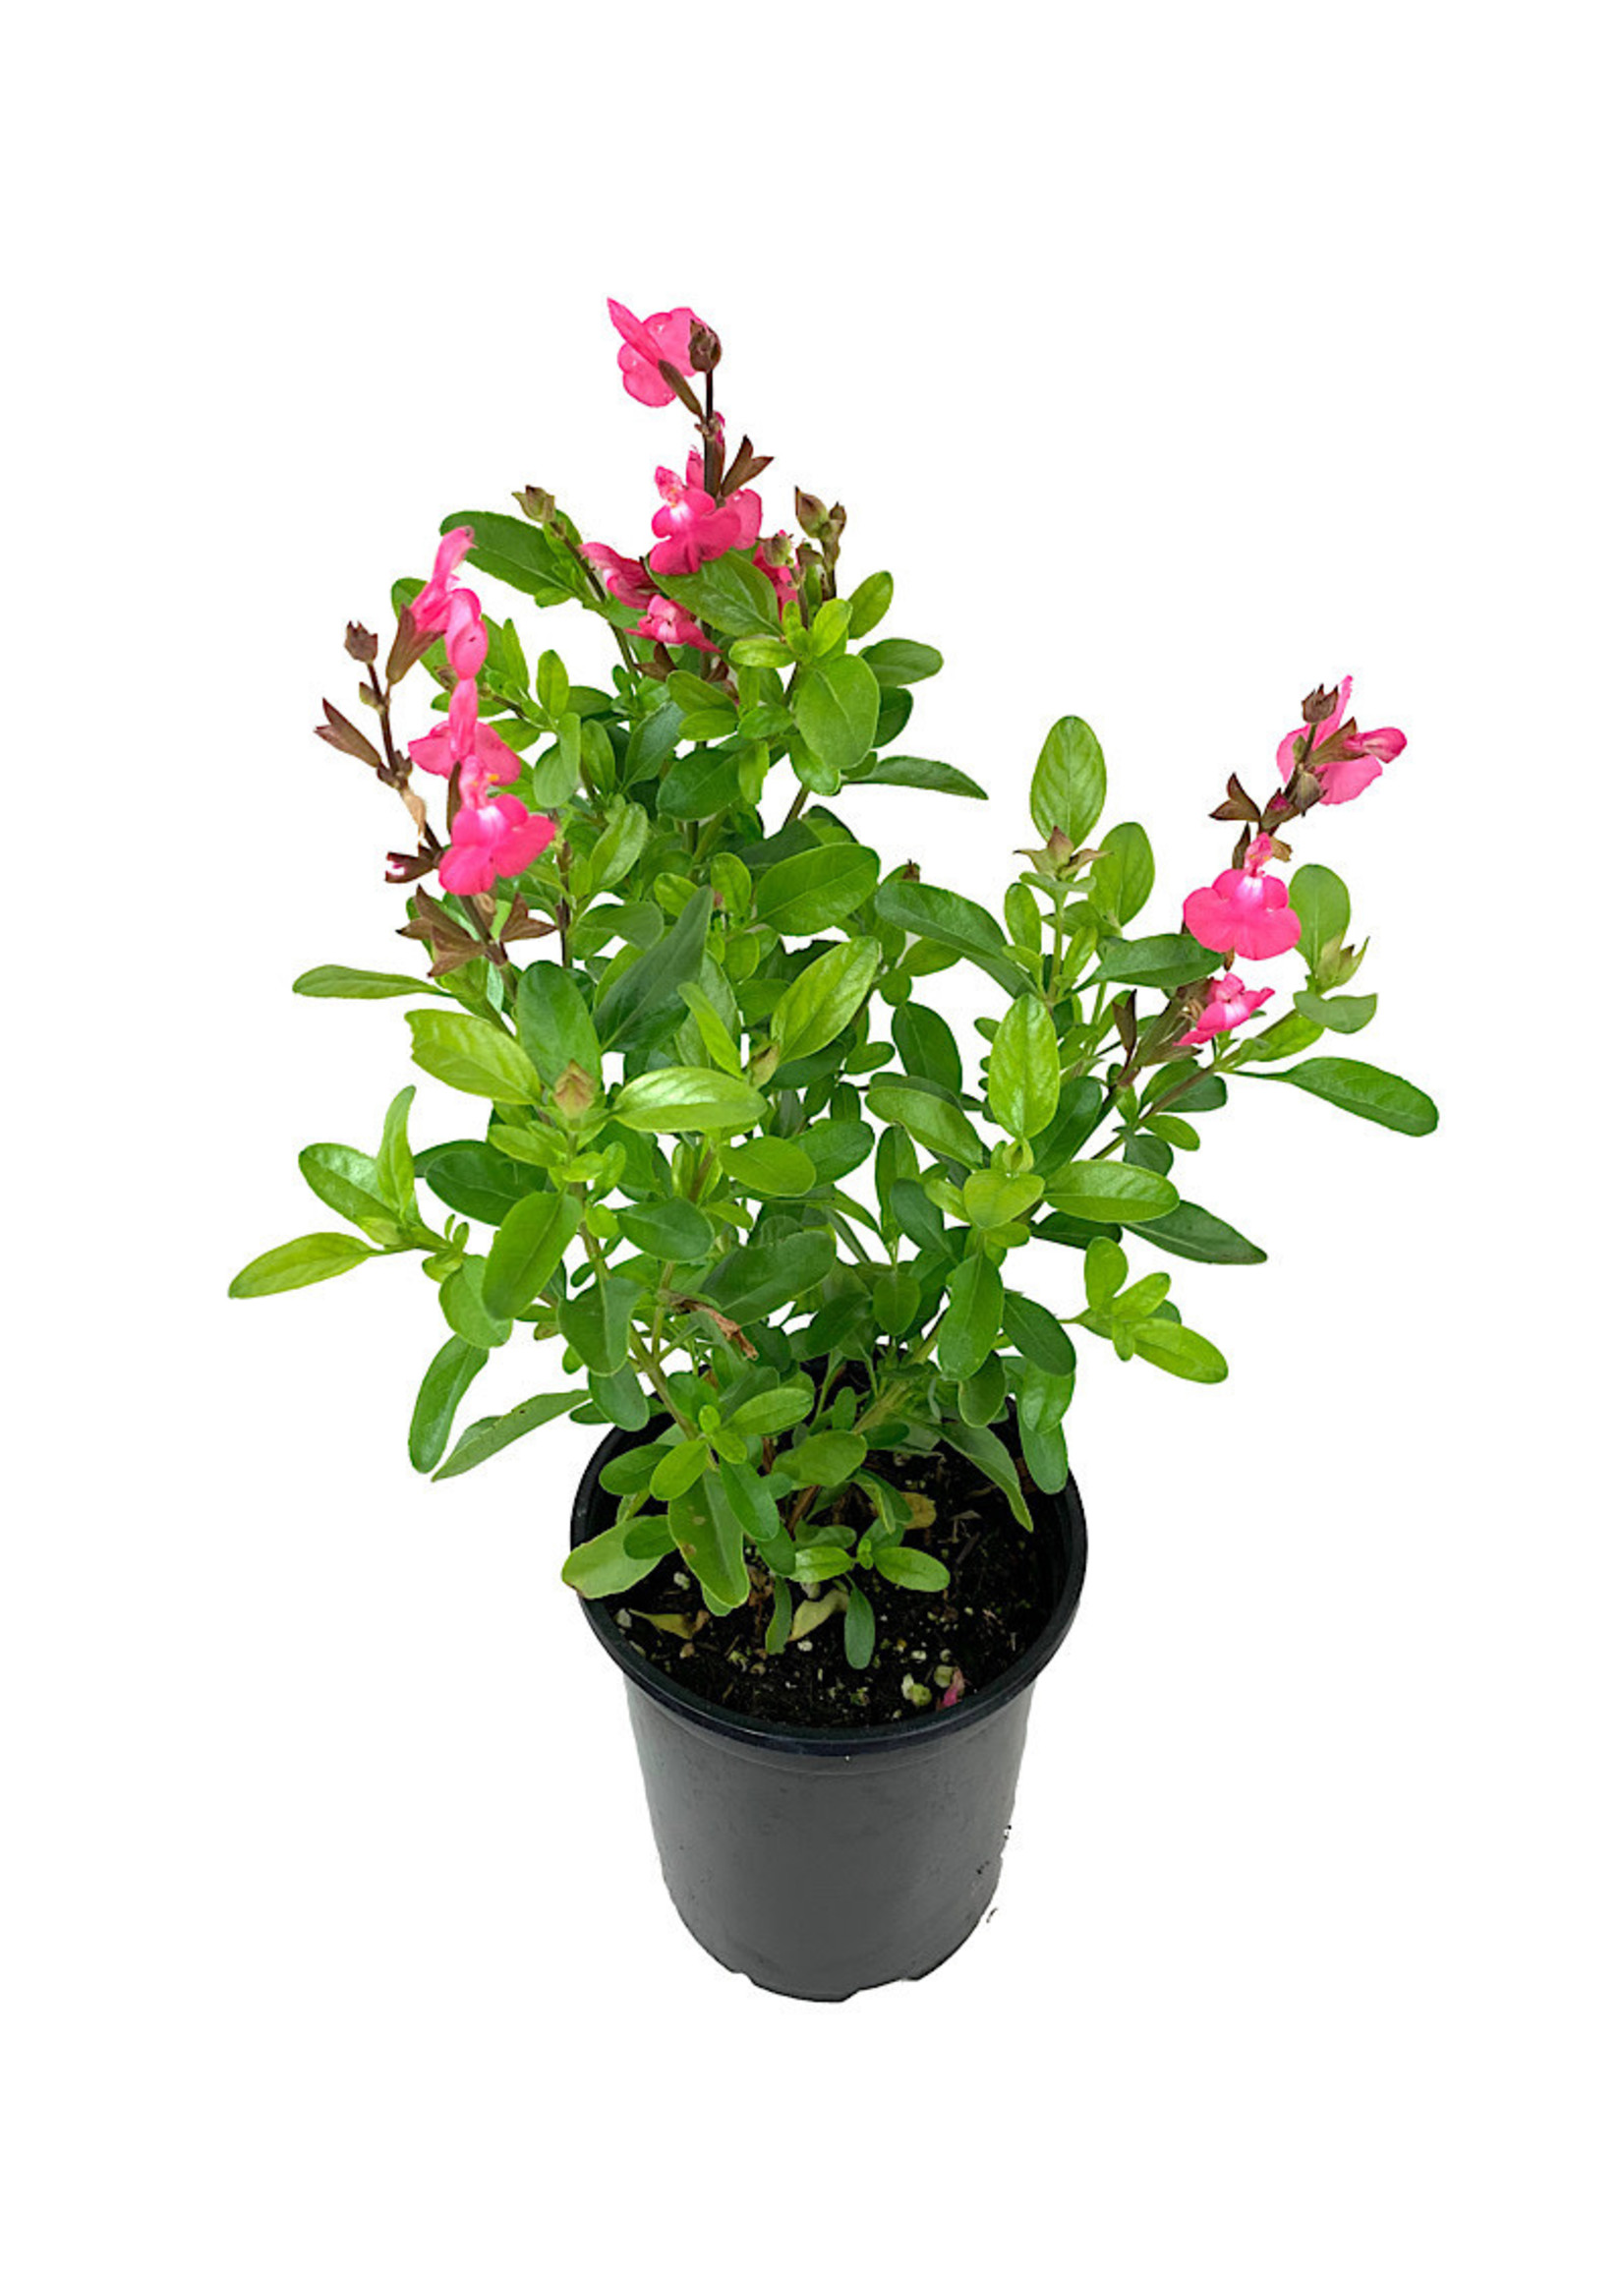 Salvia greggi 'Mirage Pink' Quart